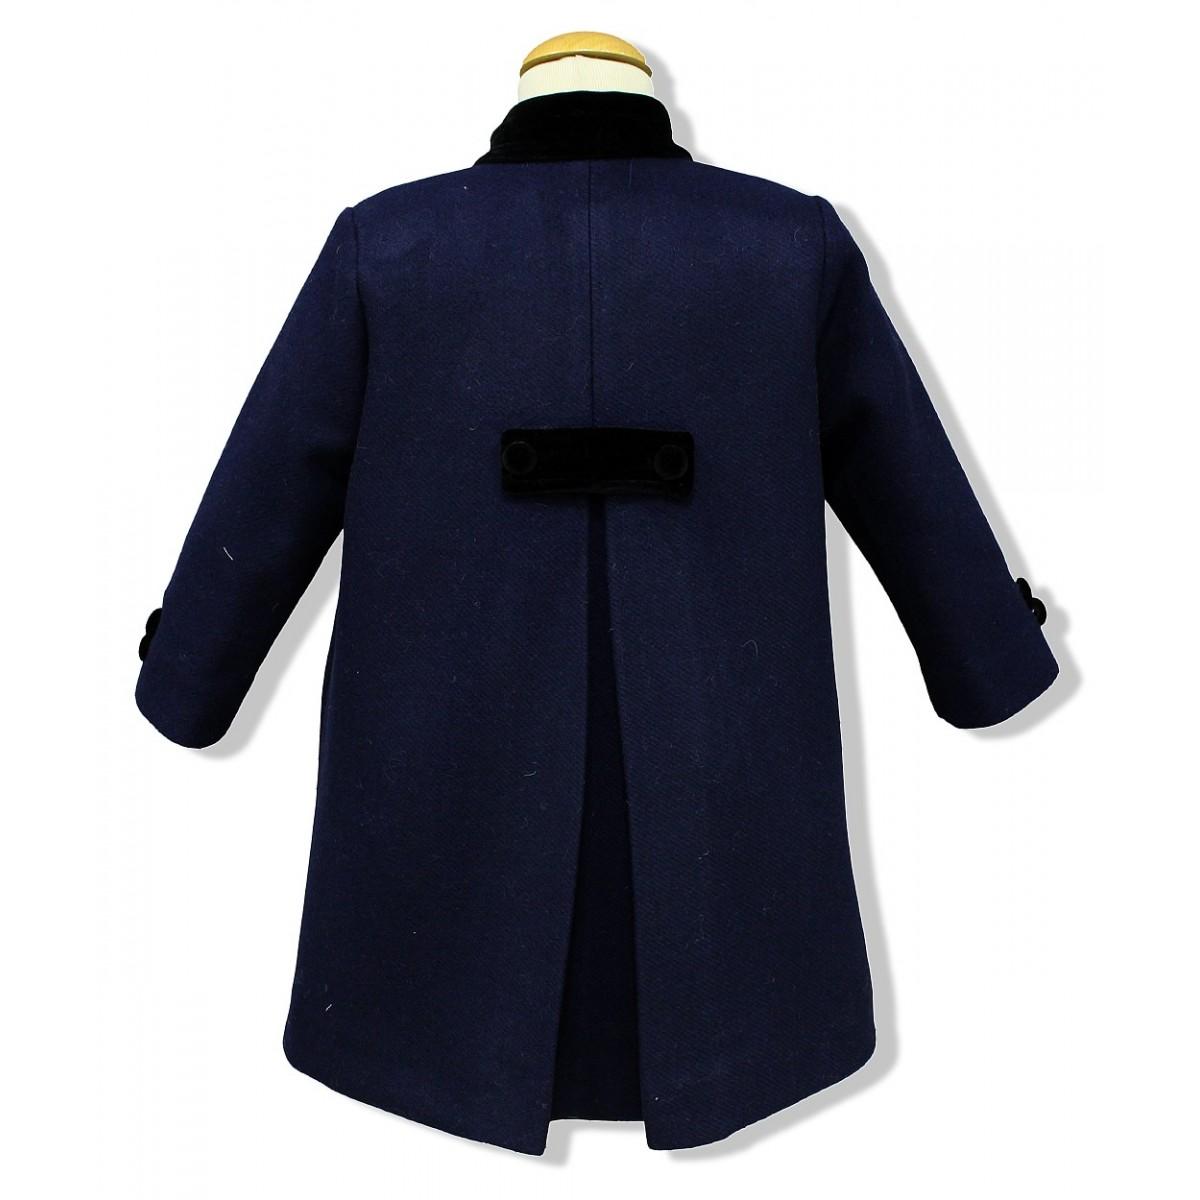 Double Breast Children Coat Navy Blue Wool English Coat For Kids